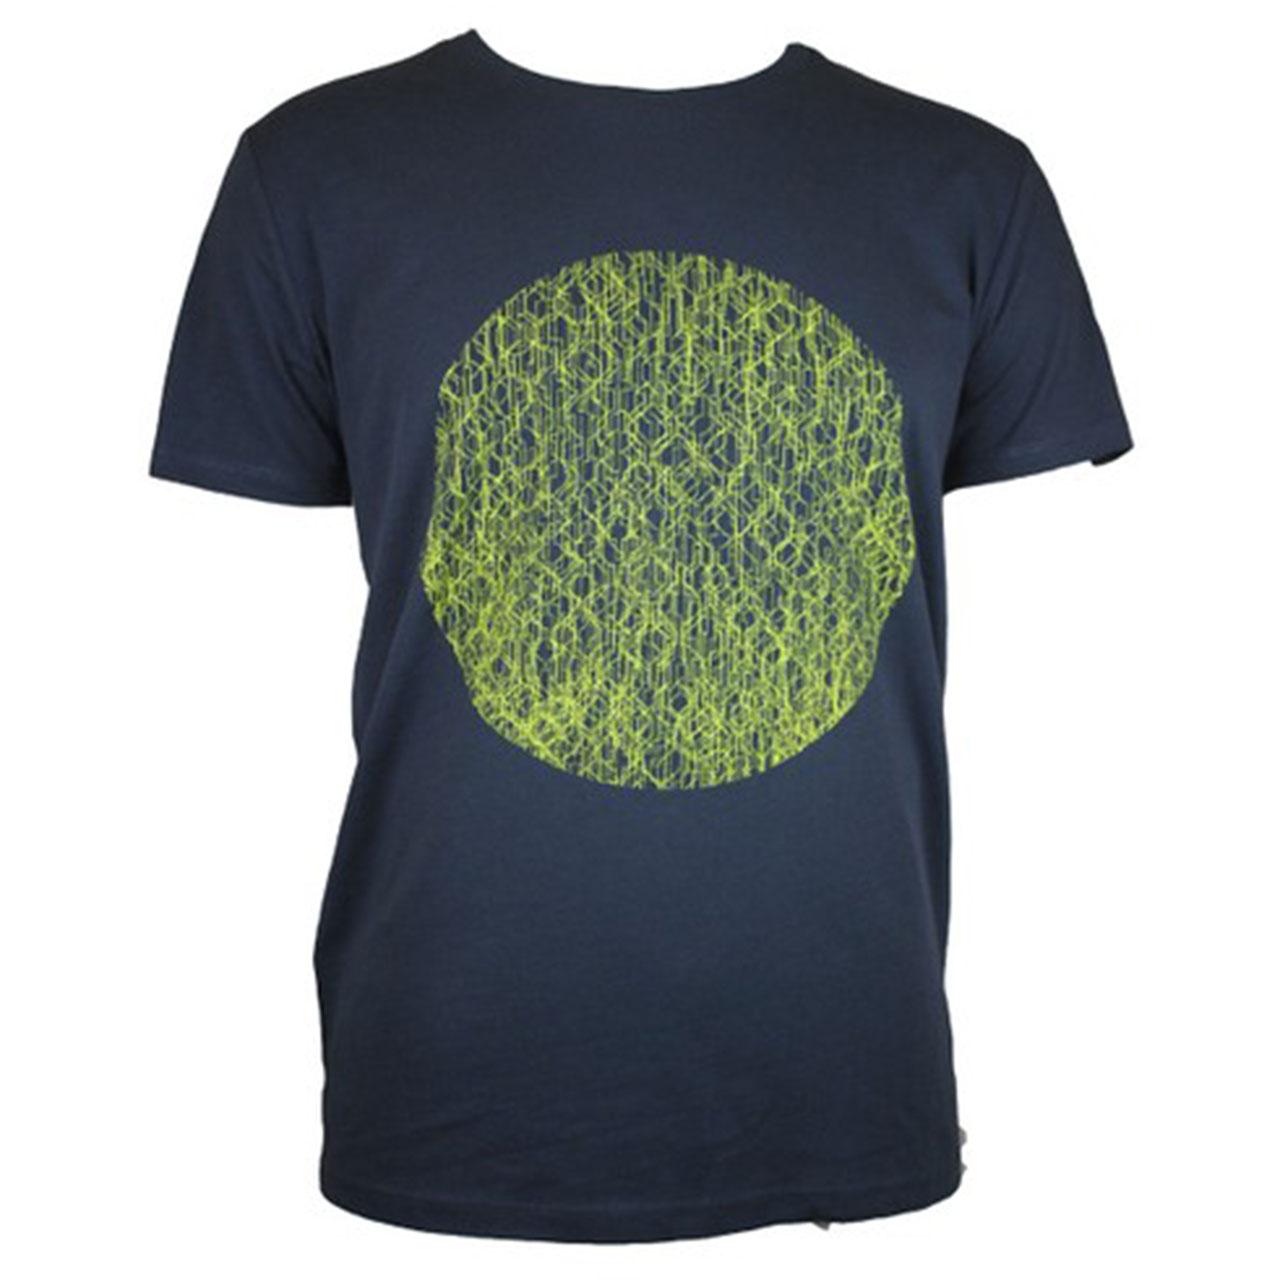 T-Shirt Fernsehturm Kreis men grau/gelb